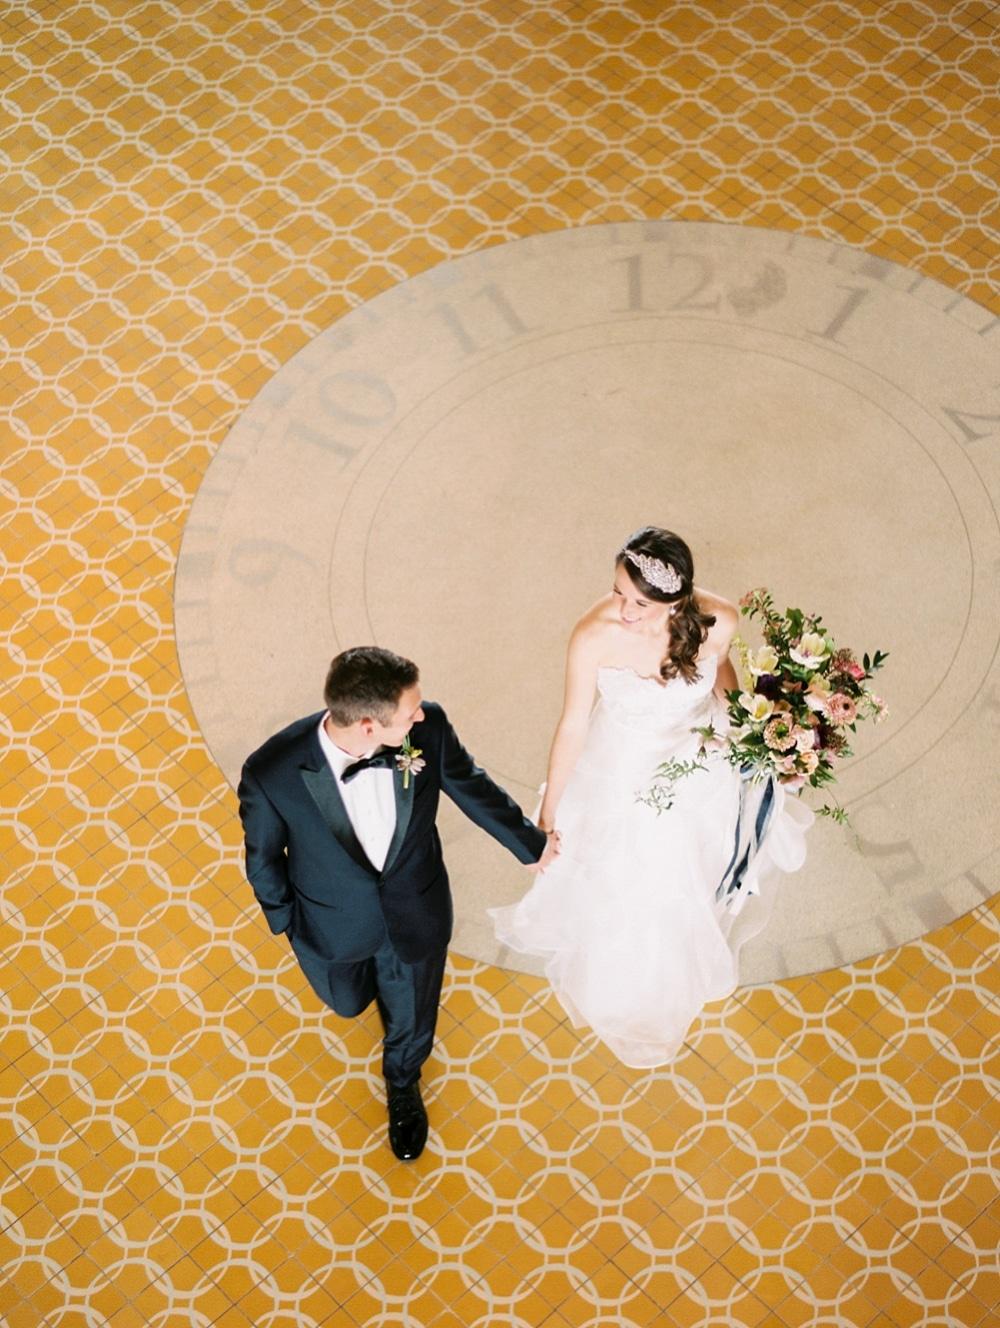 Kristin-La-Voie-Photography-San-Diego-Wedding-Photographer-94